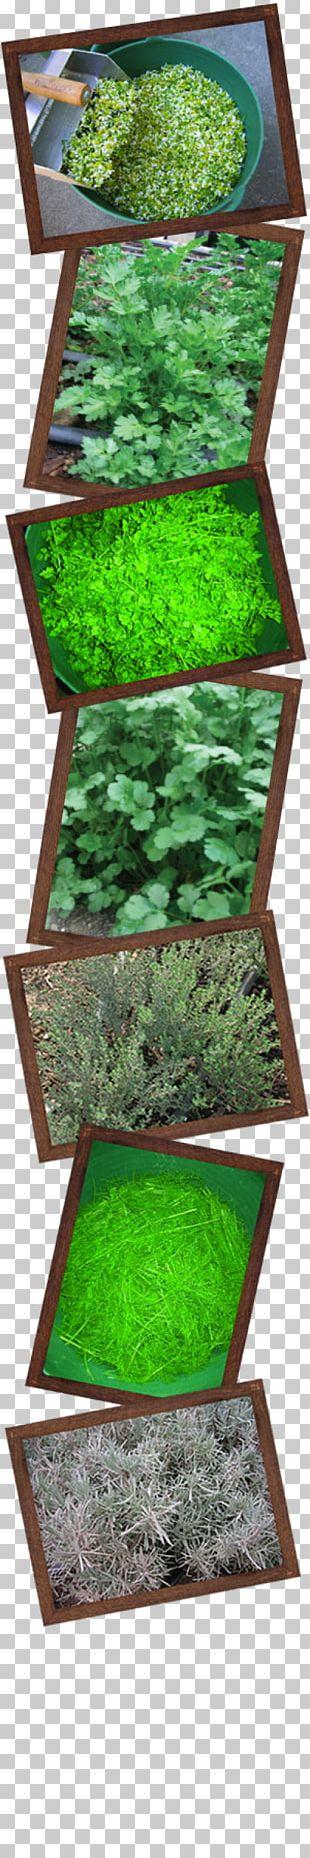 Oregano Herb Organic Food Spice Marjoram PNG